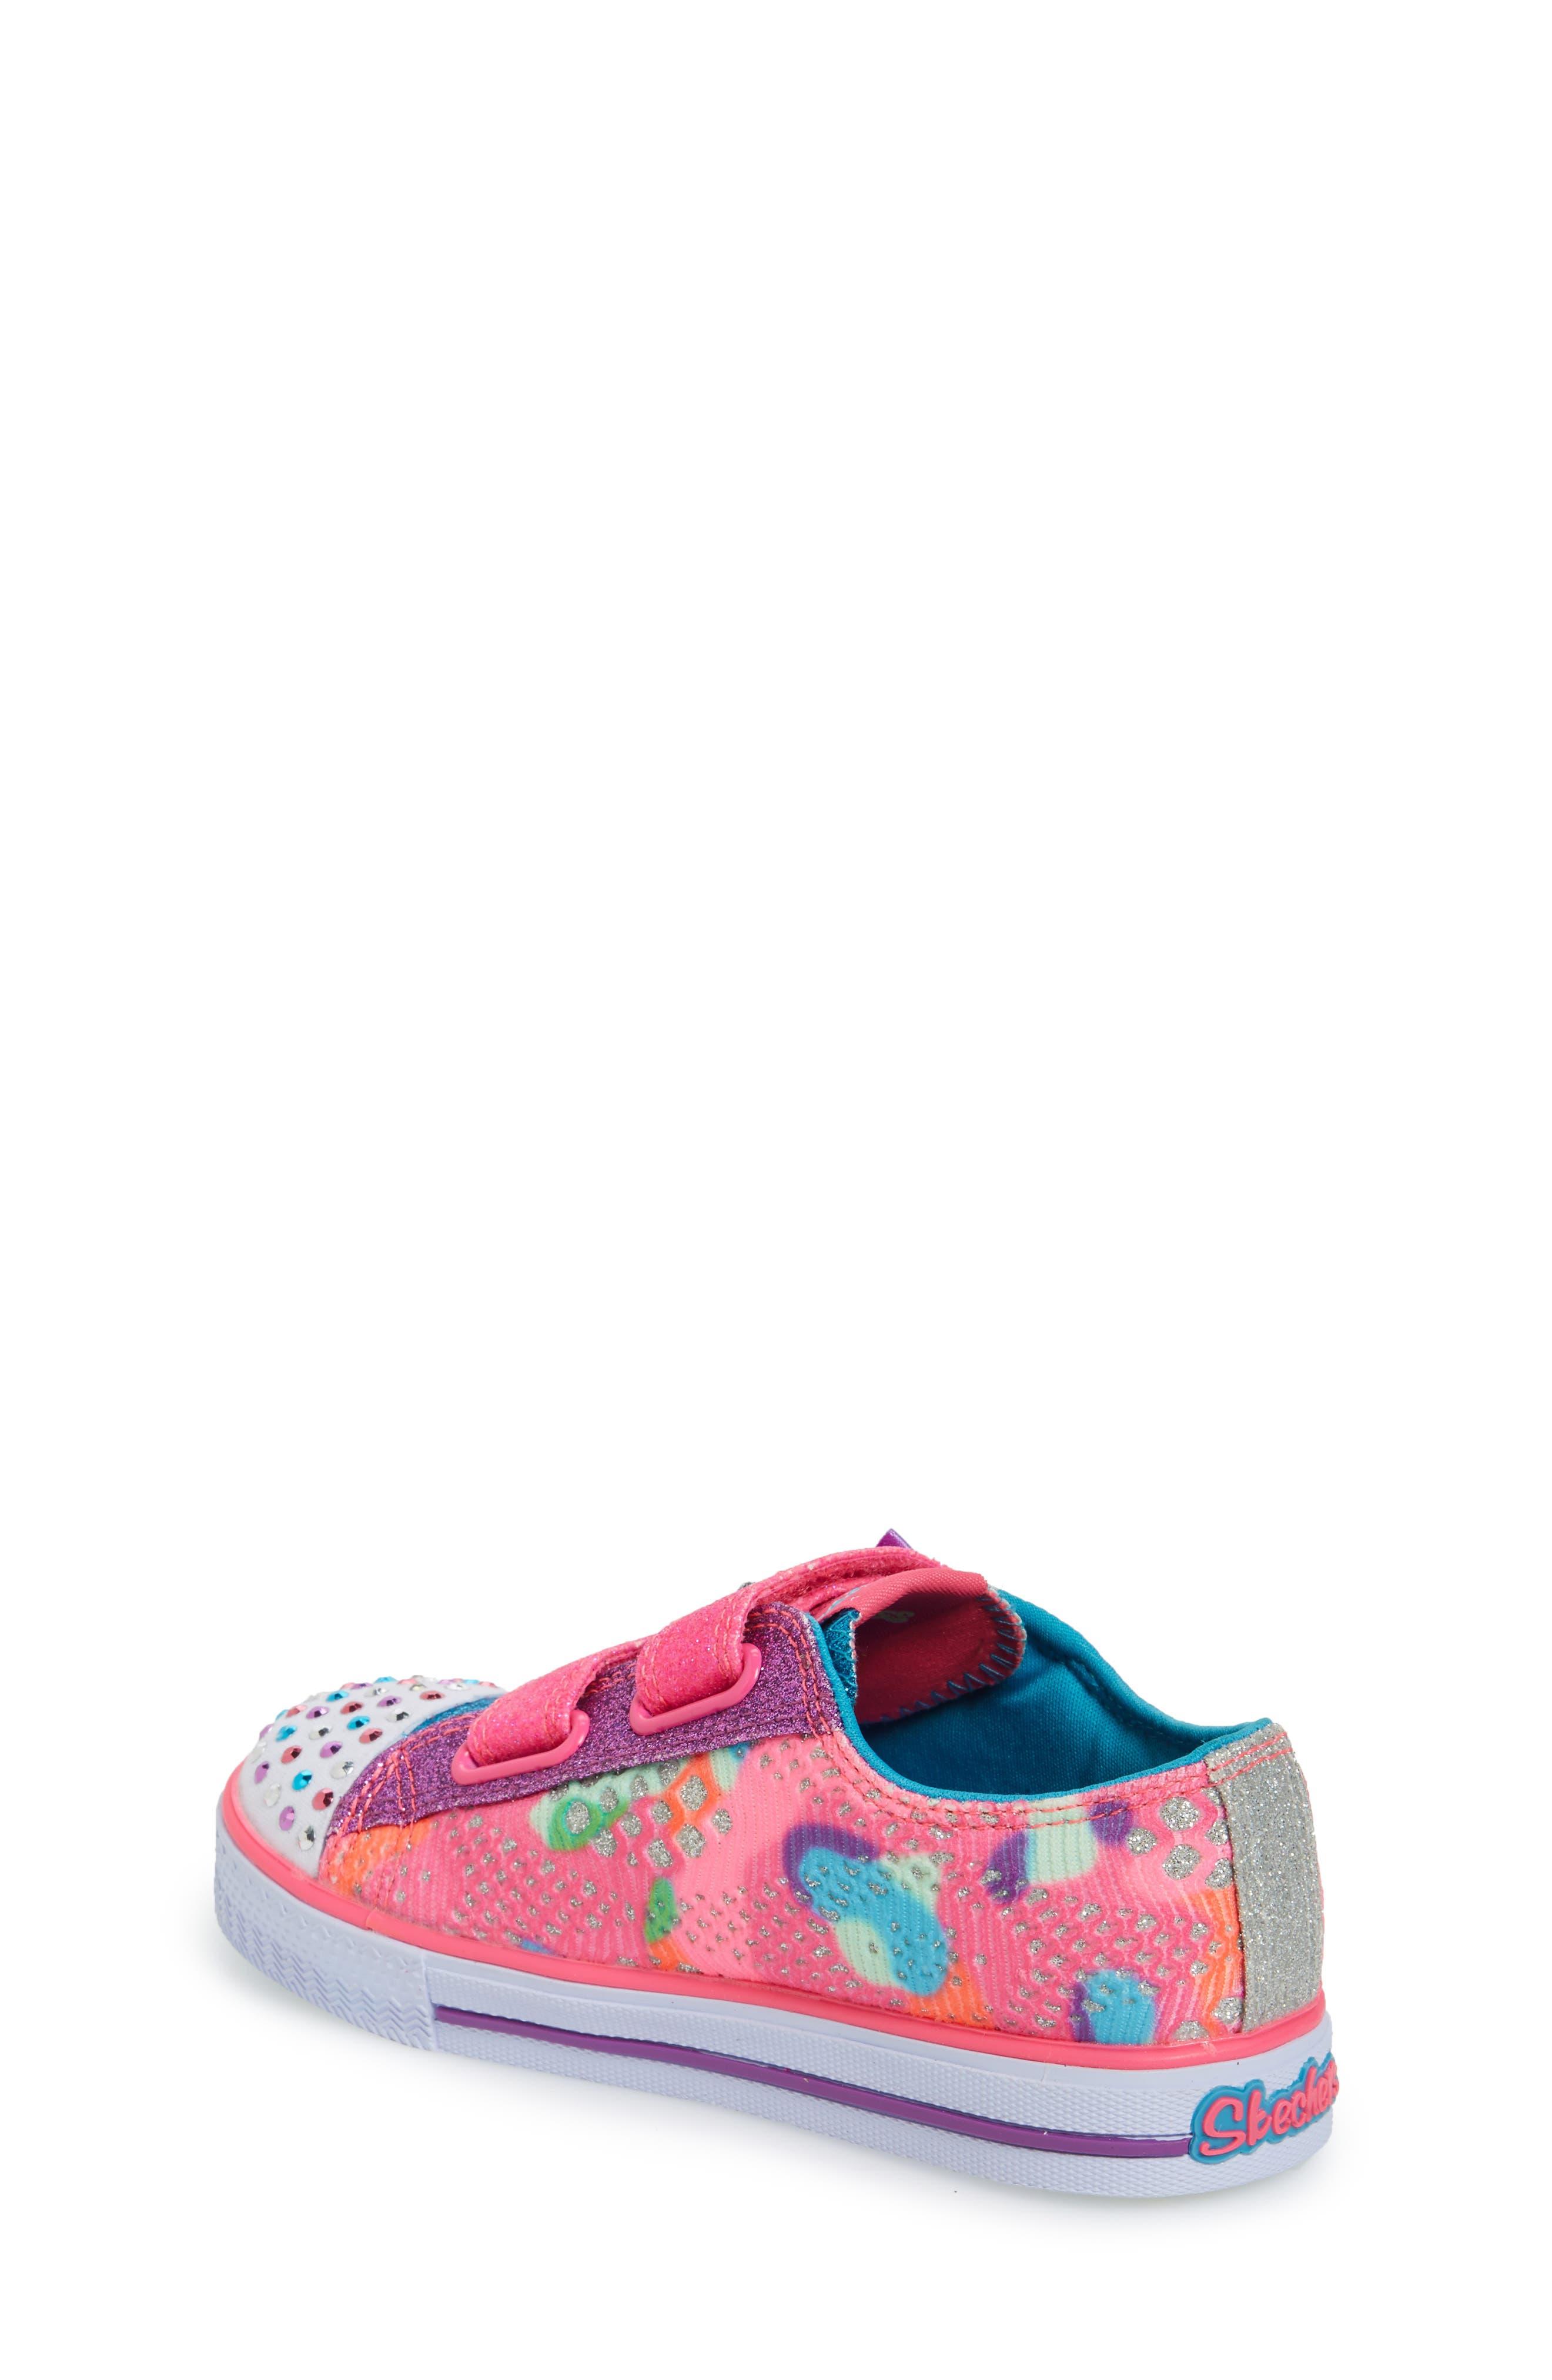 Alternate Image 2  - SKECHERS Twinkle Toes Shuffles Light-Up Sneaker (Walker & Toddler)